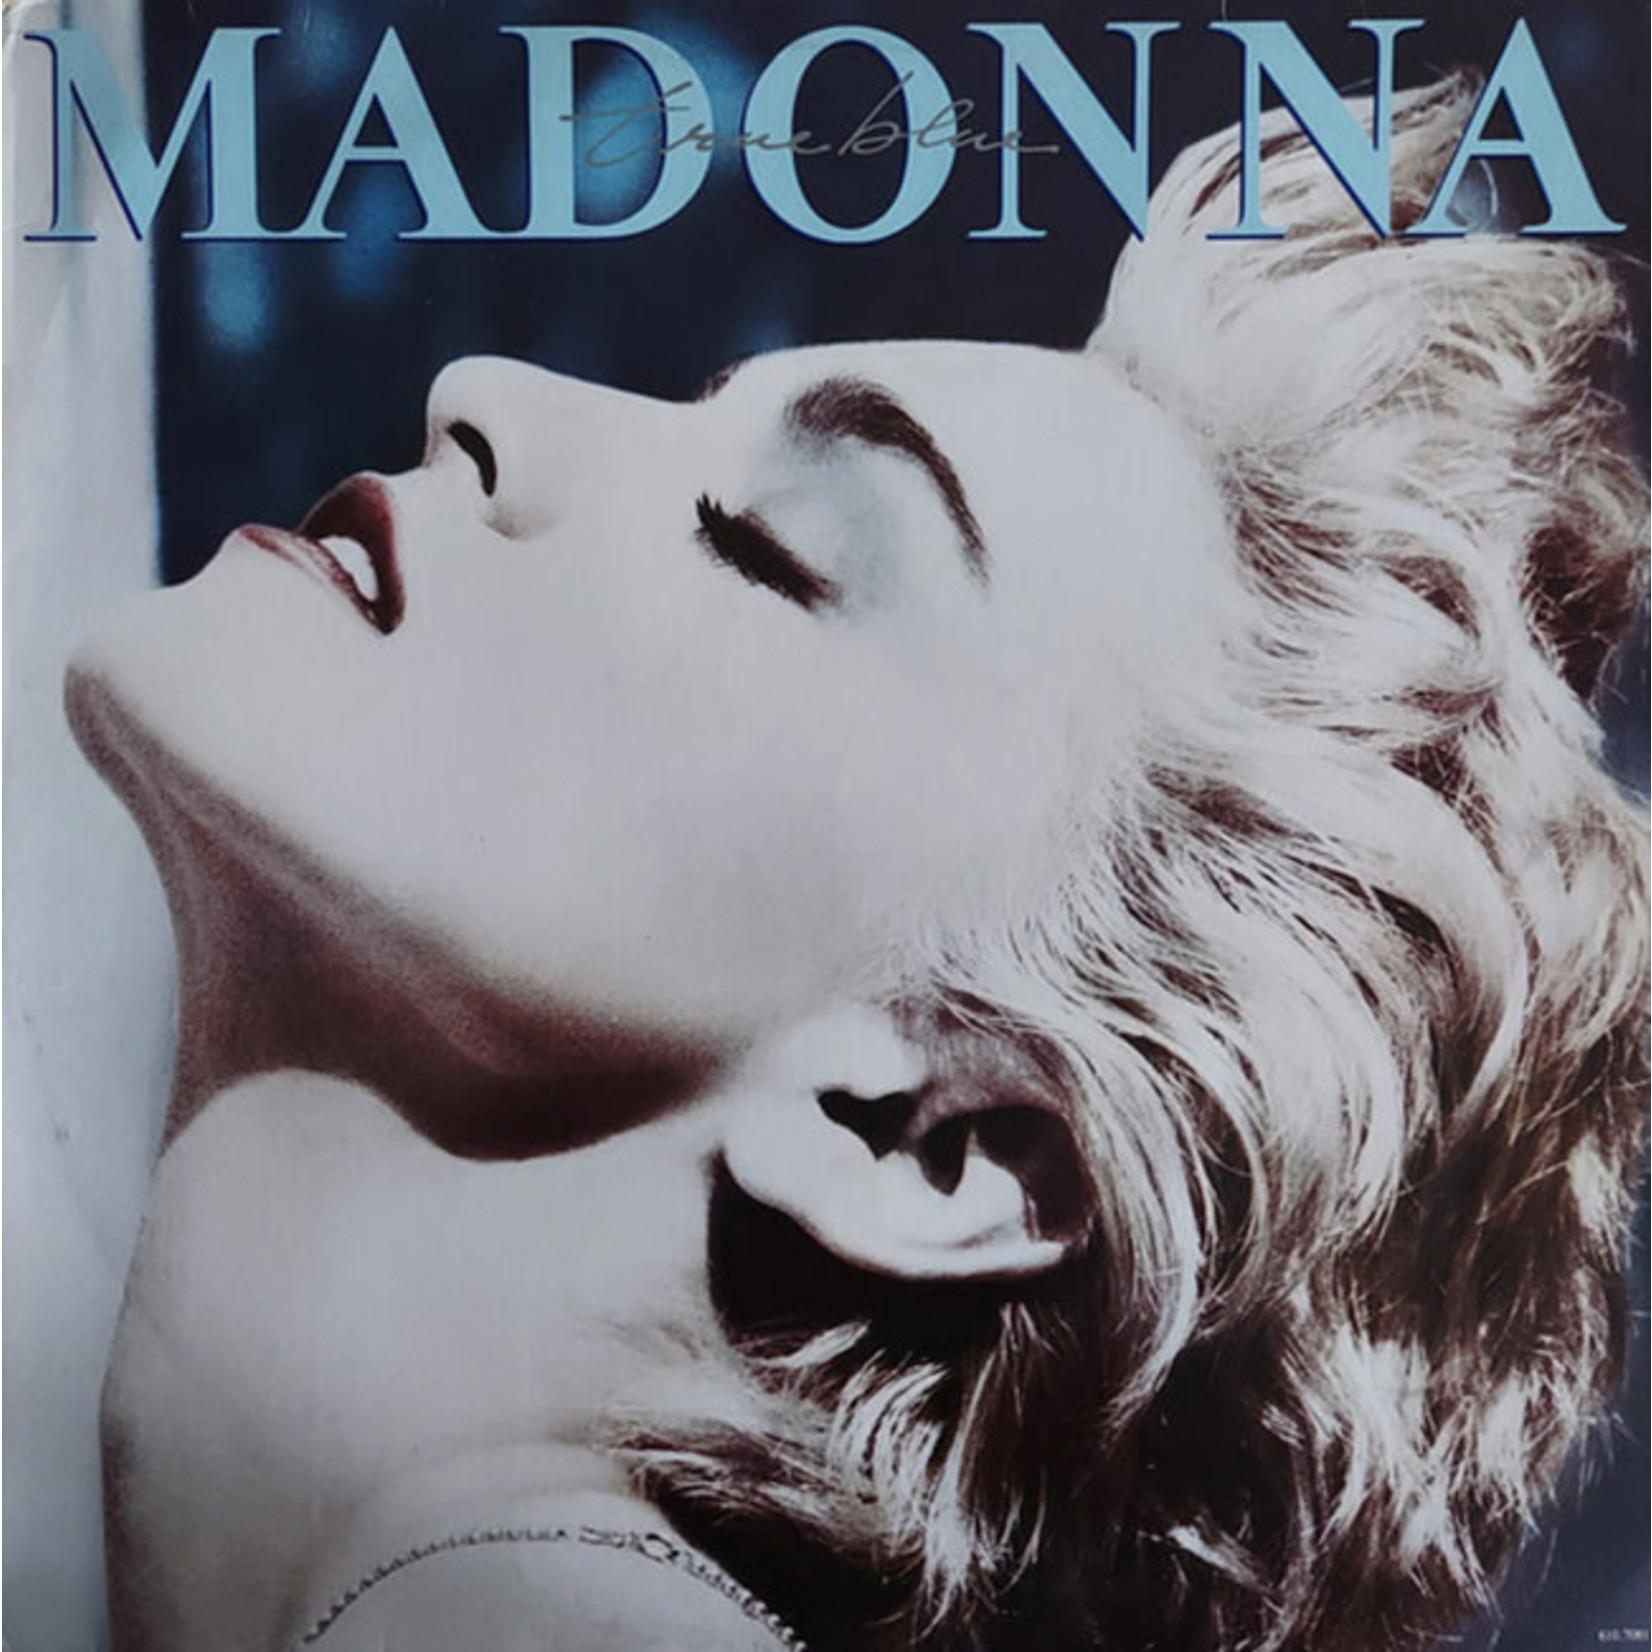 [New] Madonna: True Blue (clear vinyl) [SIRE/WARNER]